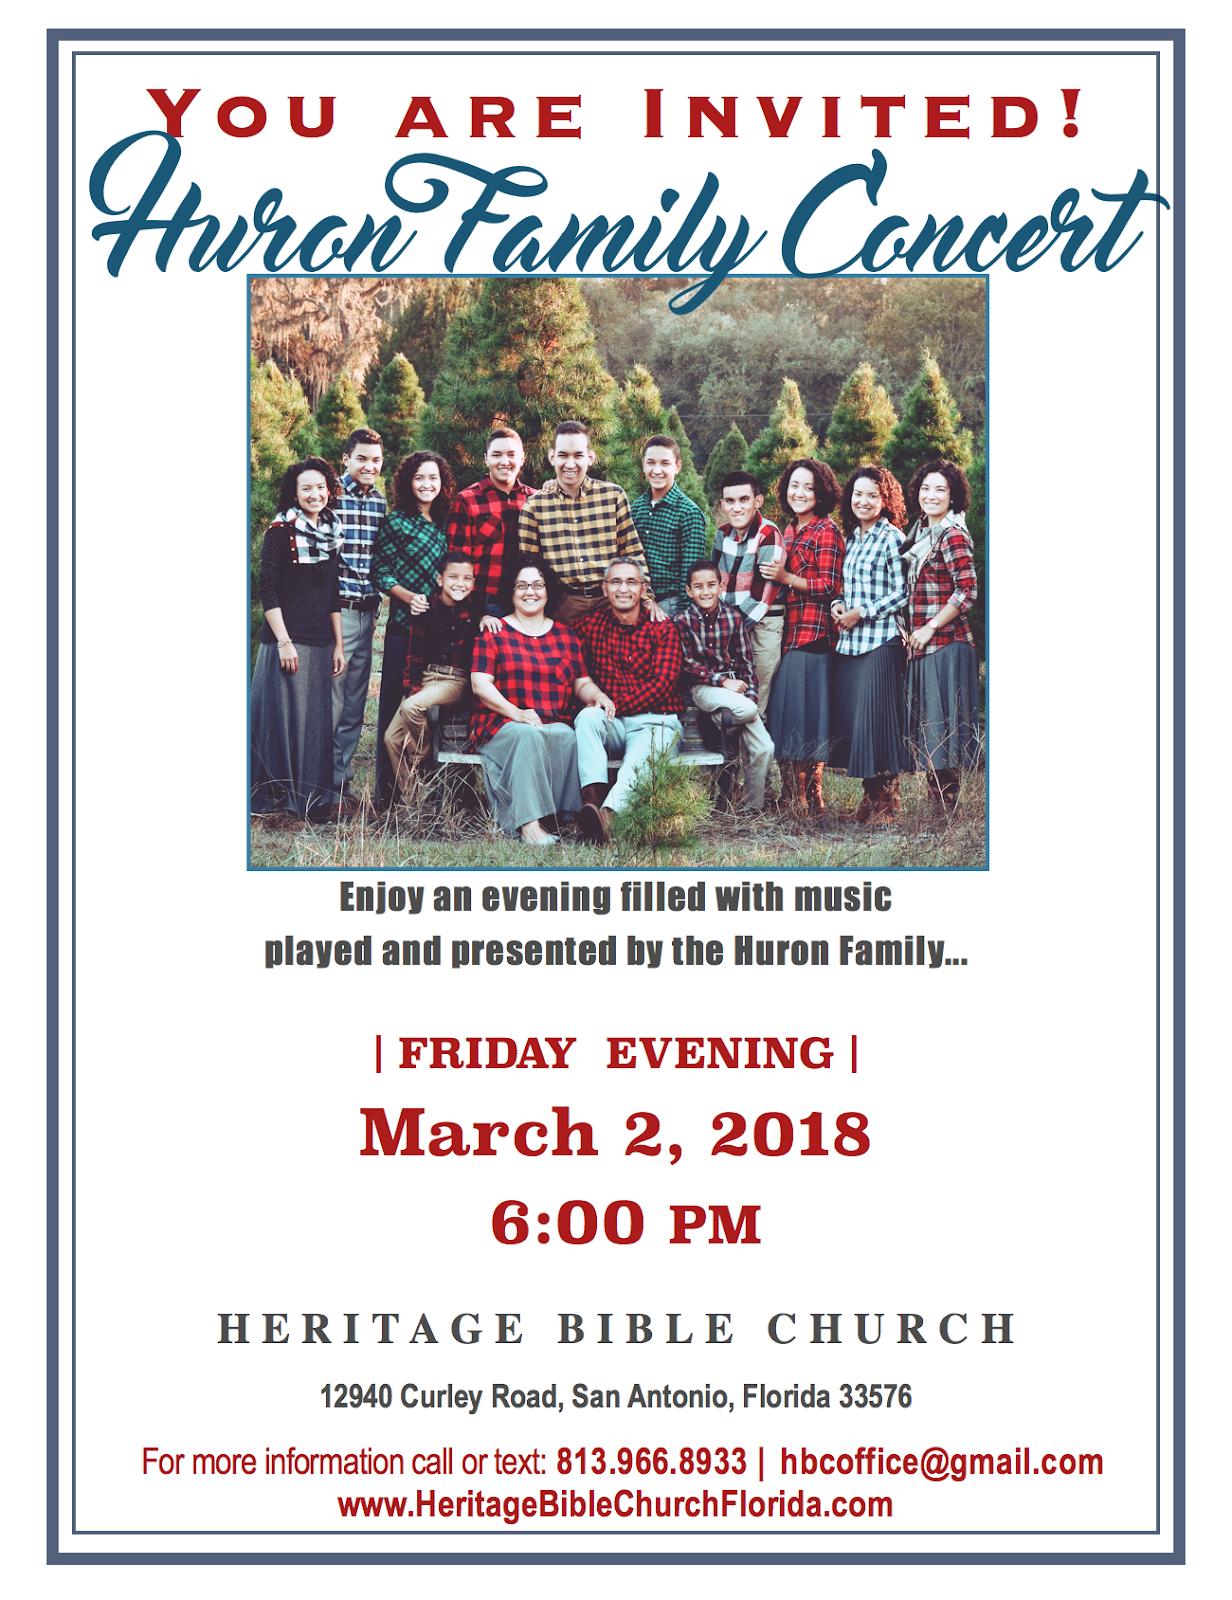 Huron Family Concert